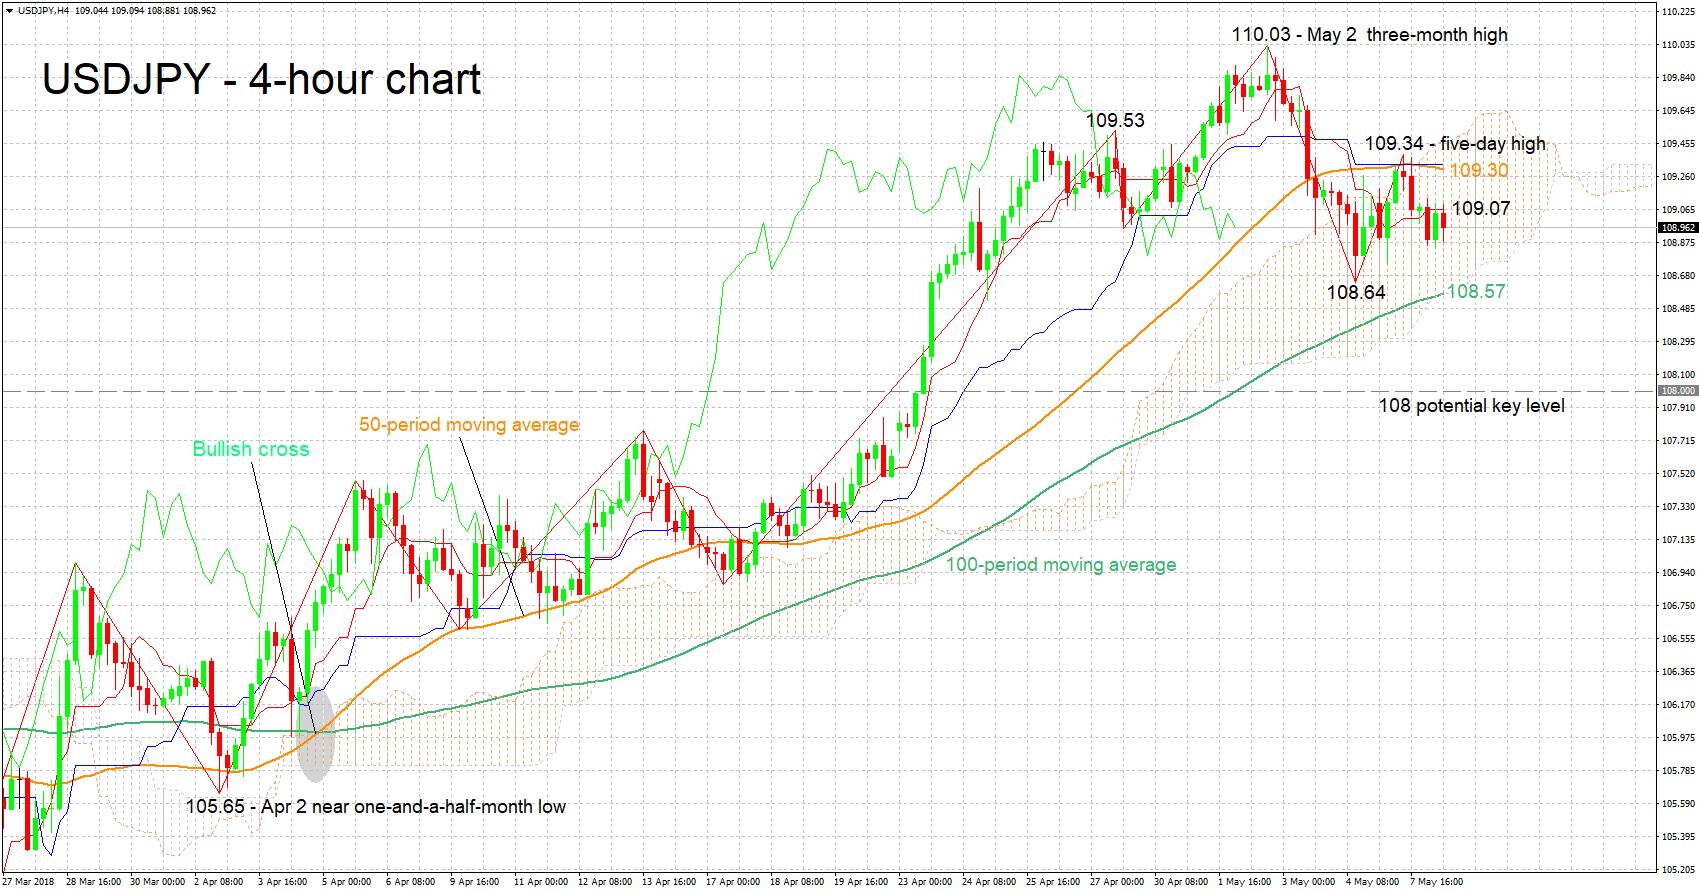 Dollar gains against the yen amid Iran uncertainty